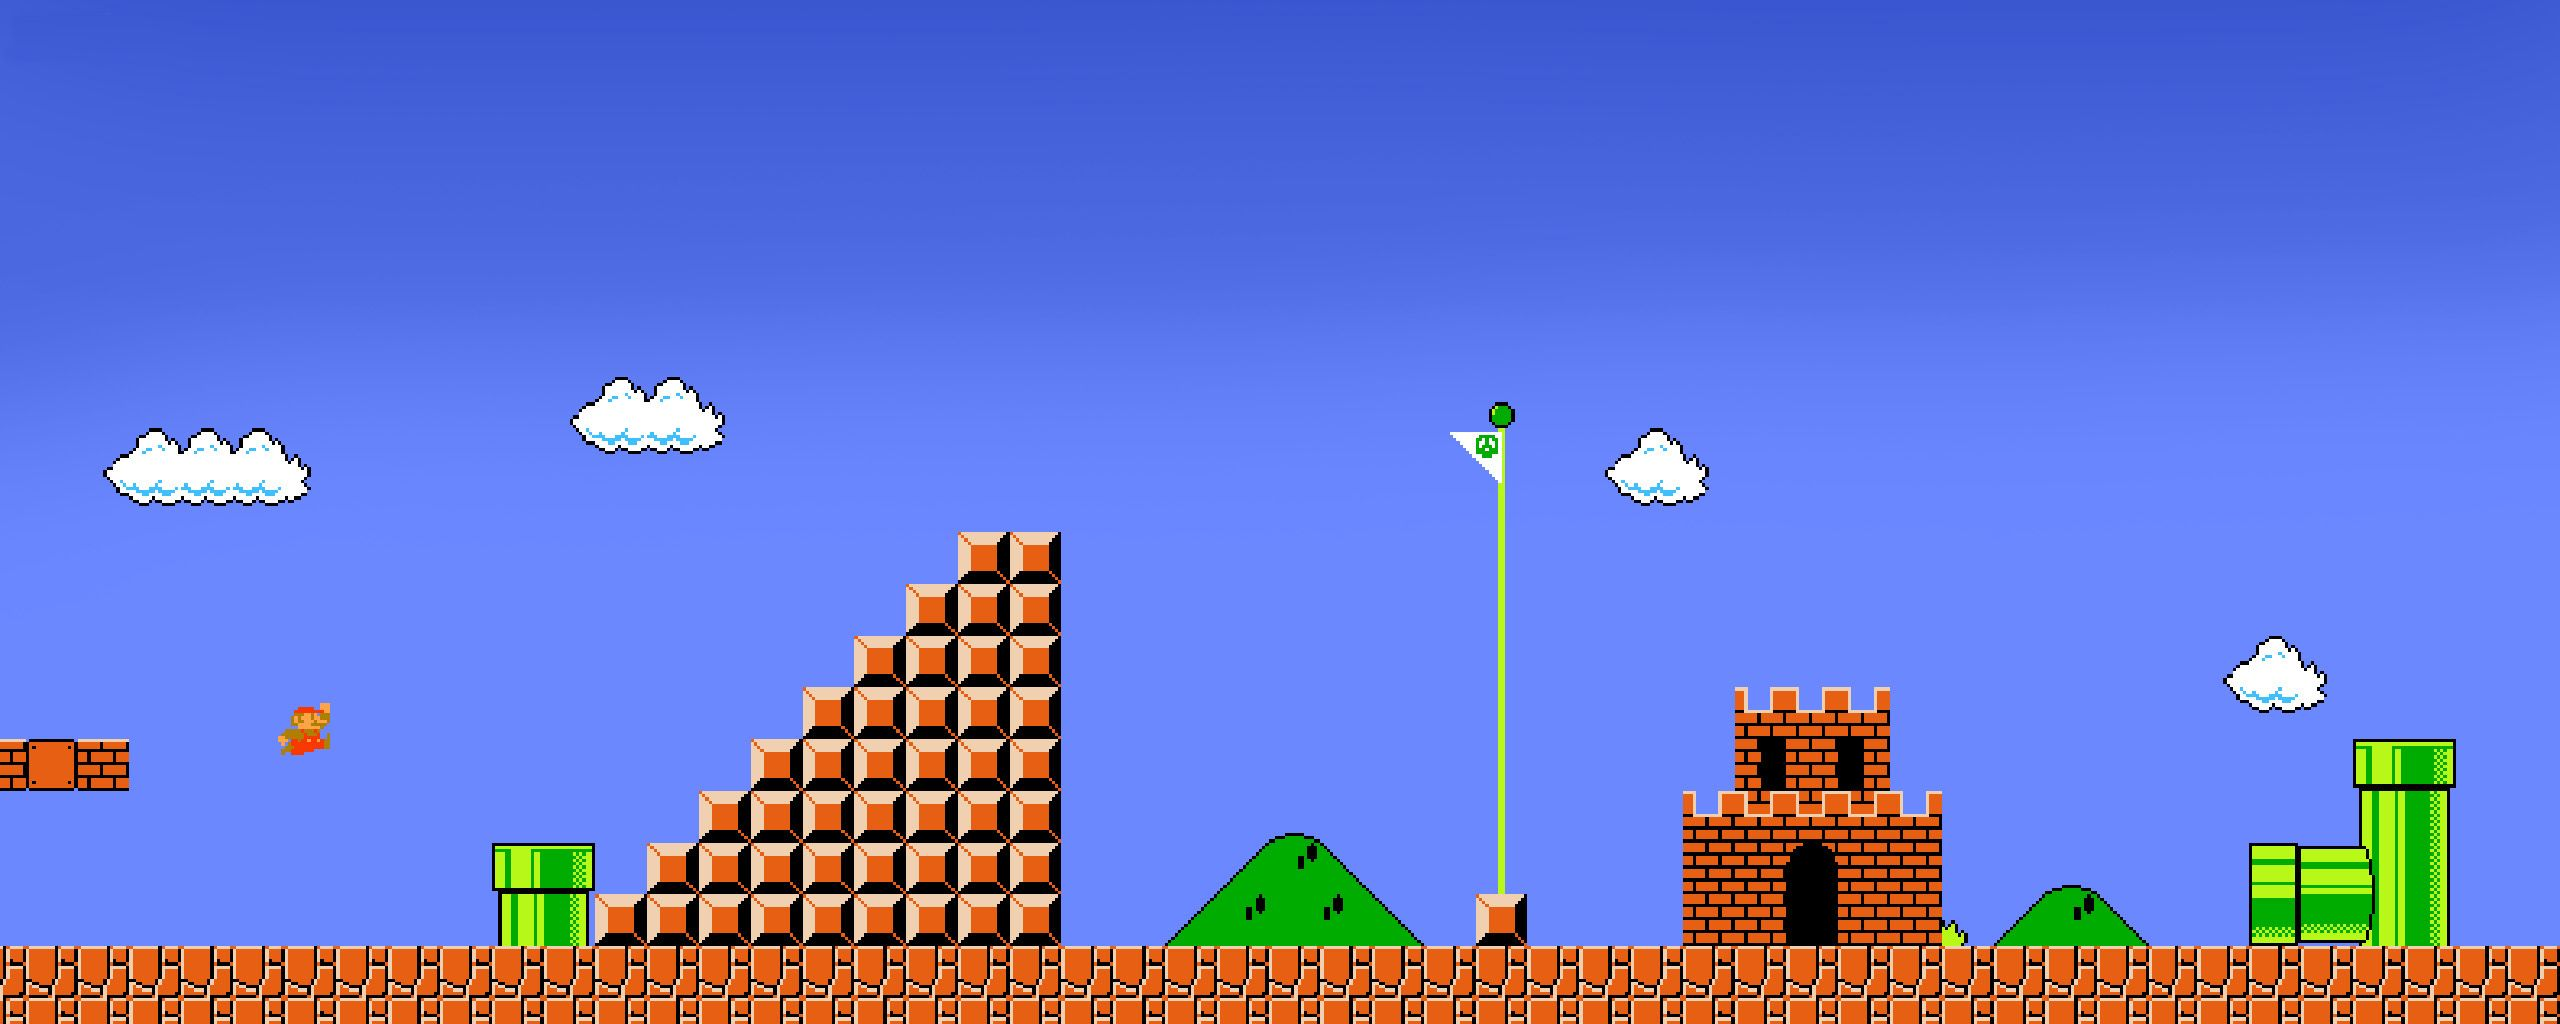 Pin Oleh Educaronline Di Nintendo Co